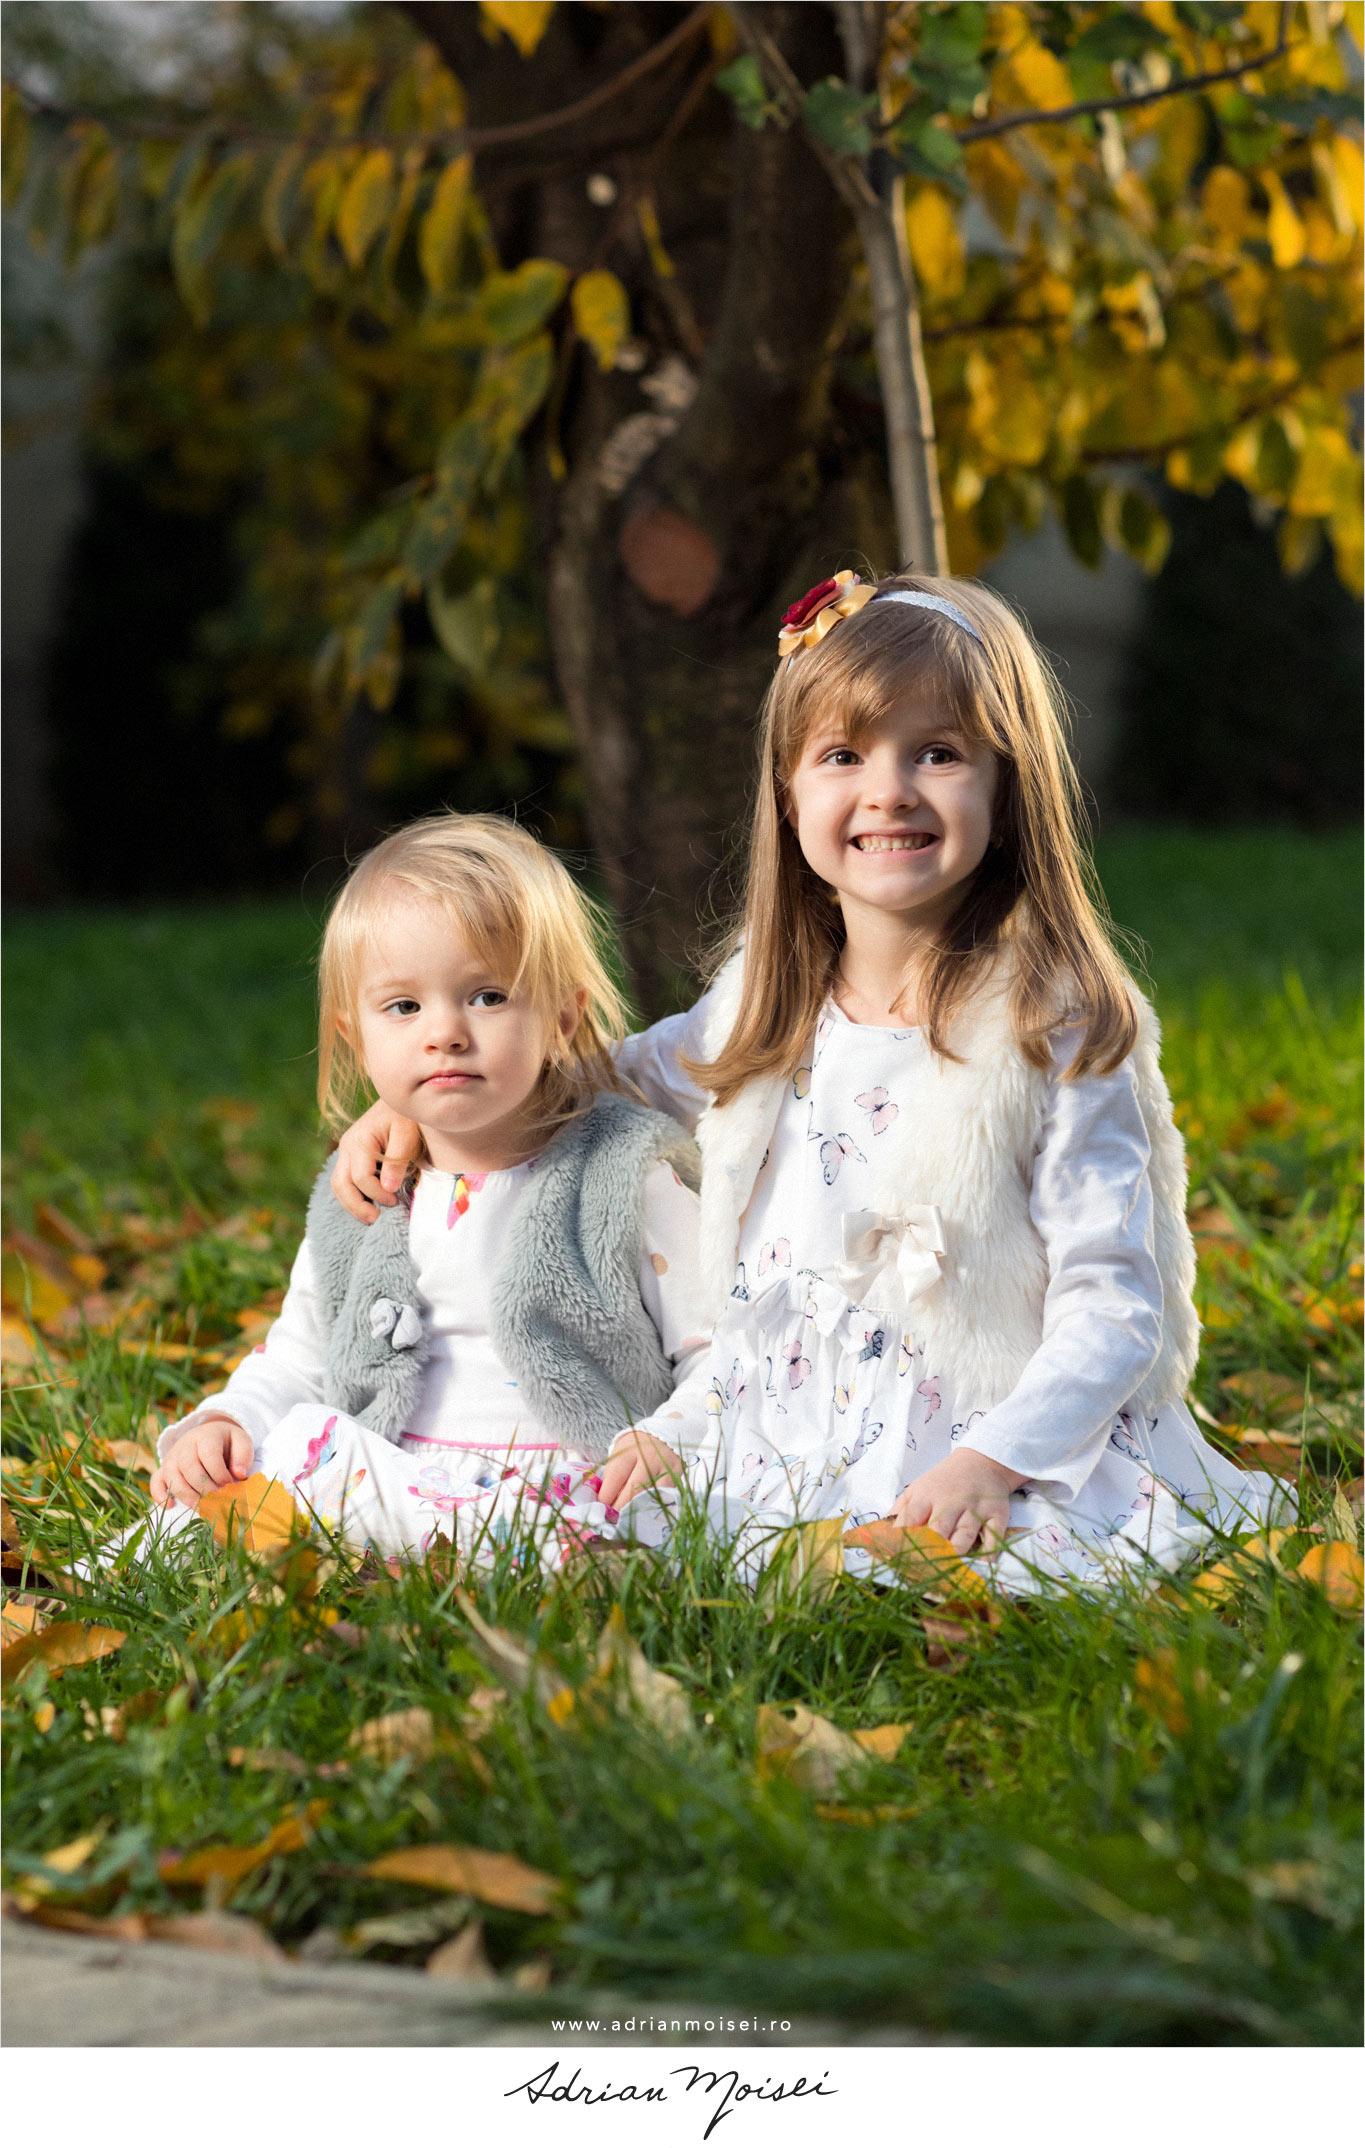 Fotografie de familie Iasi in livada mea de la studio foto video. Fotografii toamna copii adorabili jucandu-se cu frunze printre copaci. Expresii minunate au acestia.